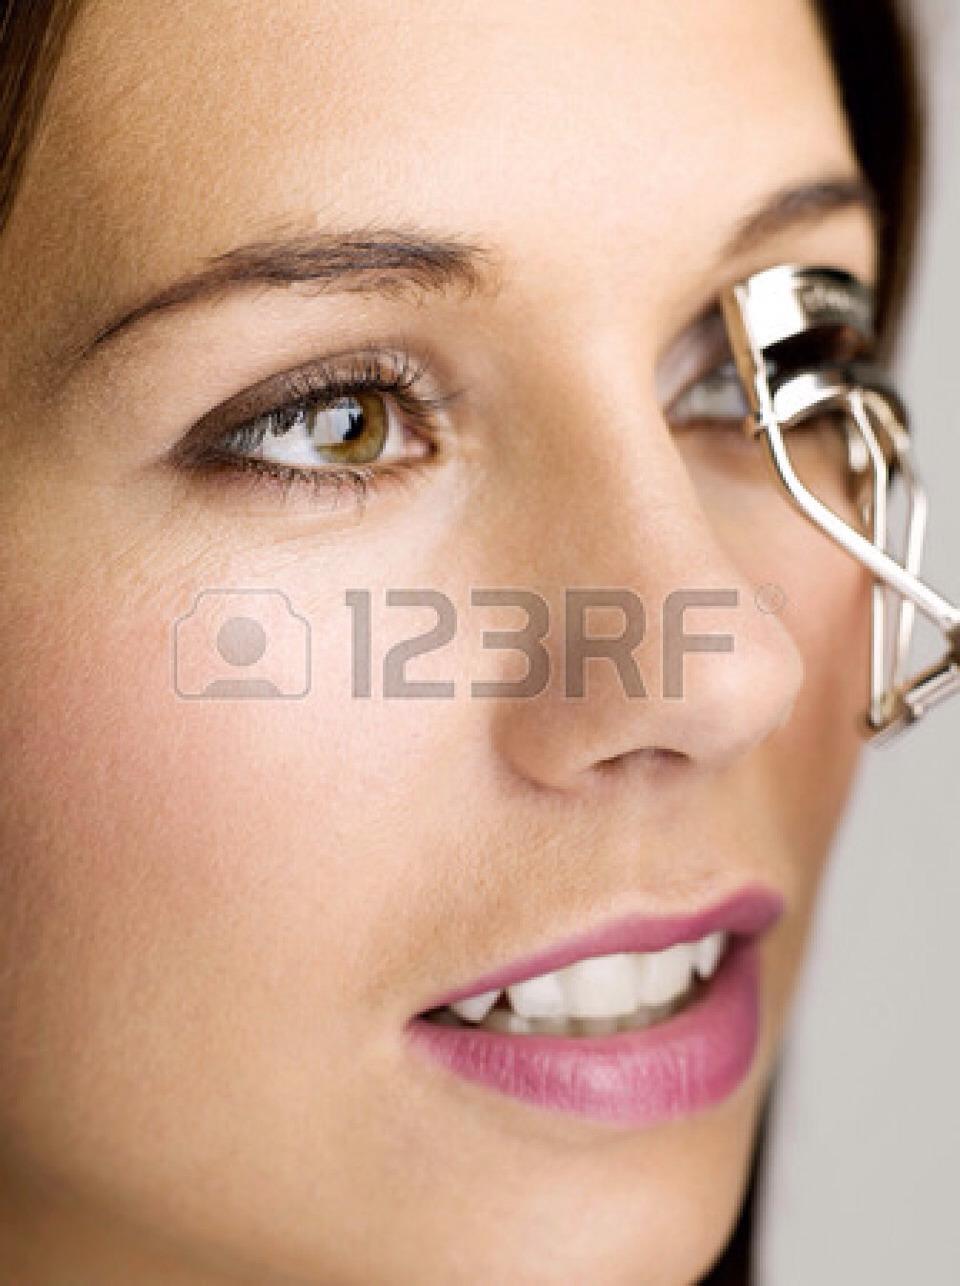 Before curling eyelashes apply....